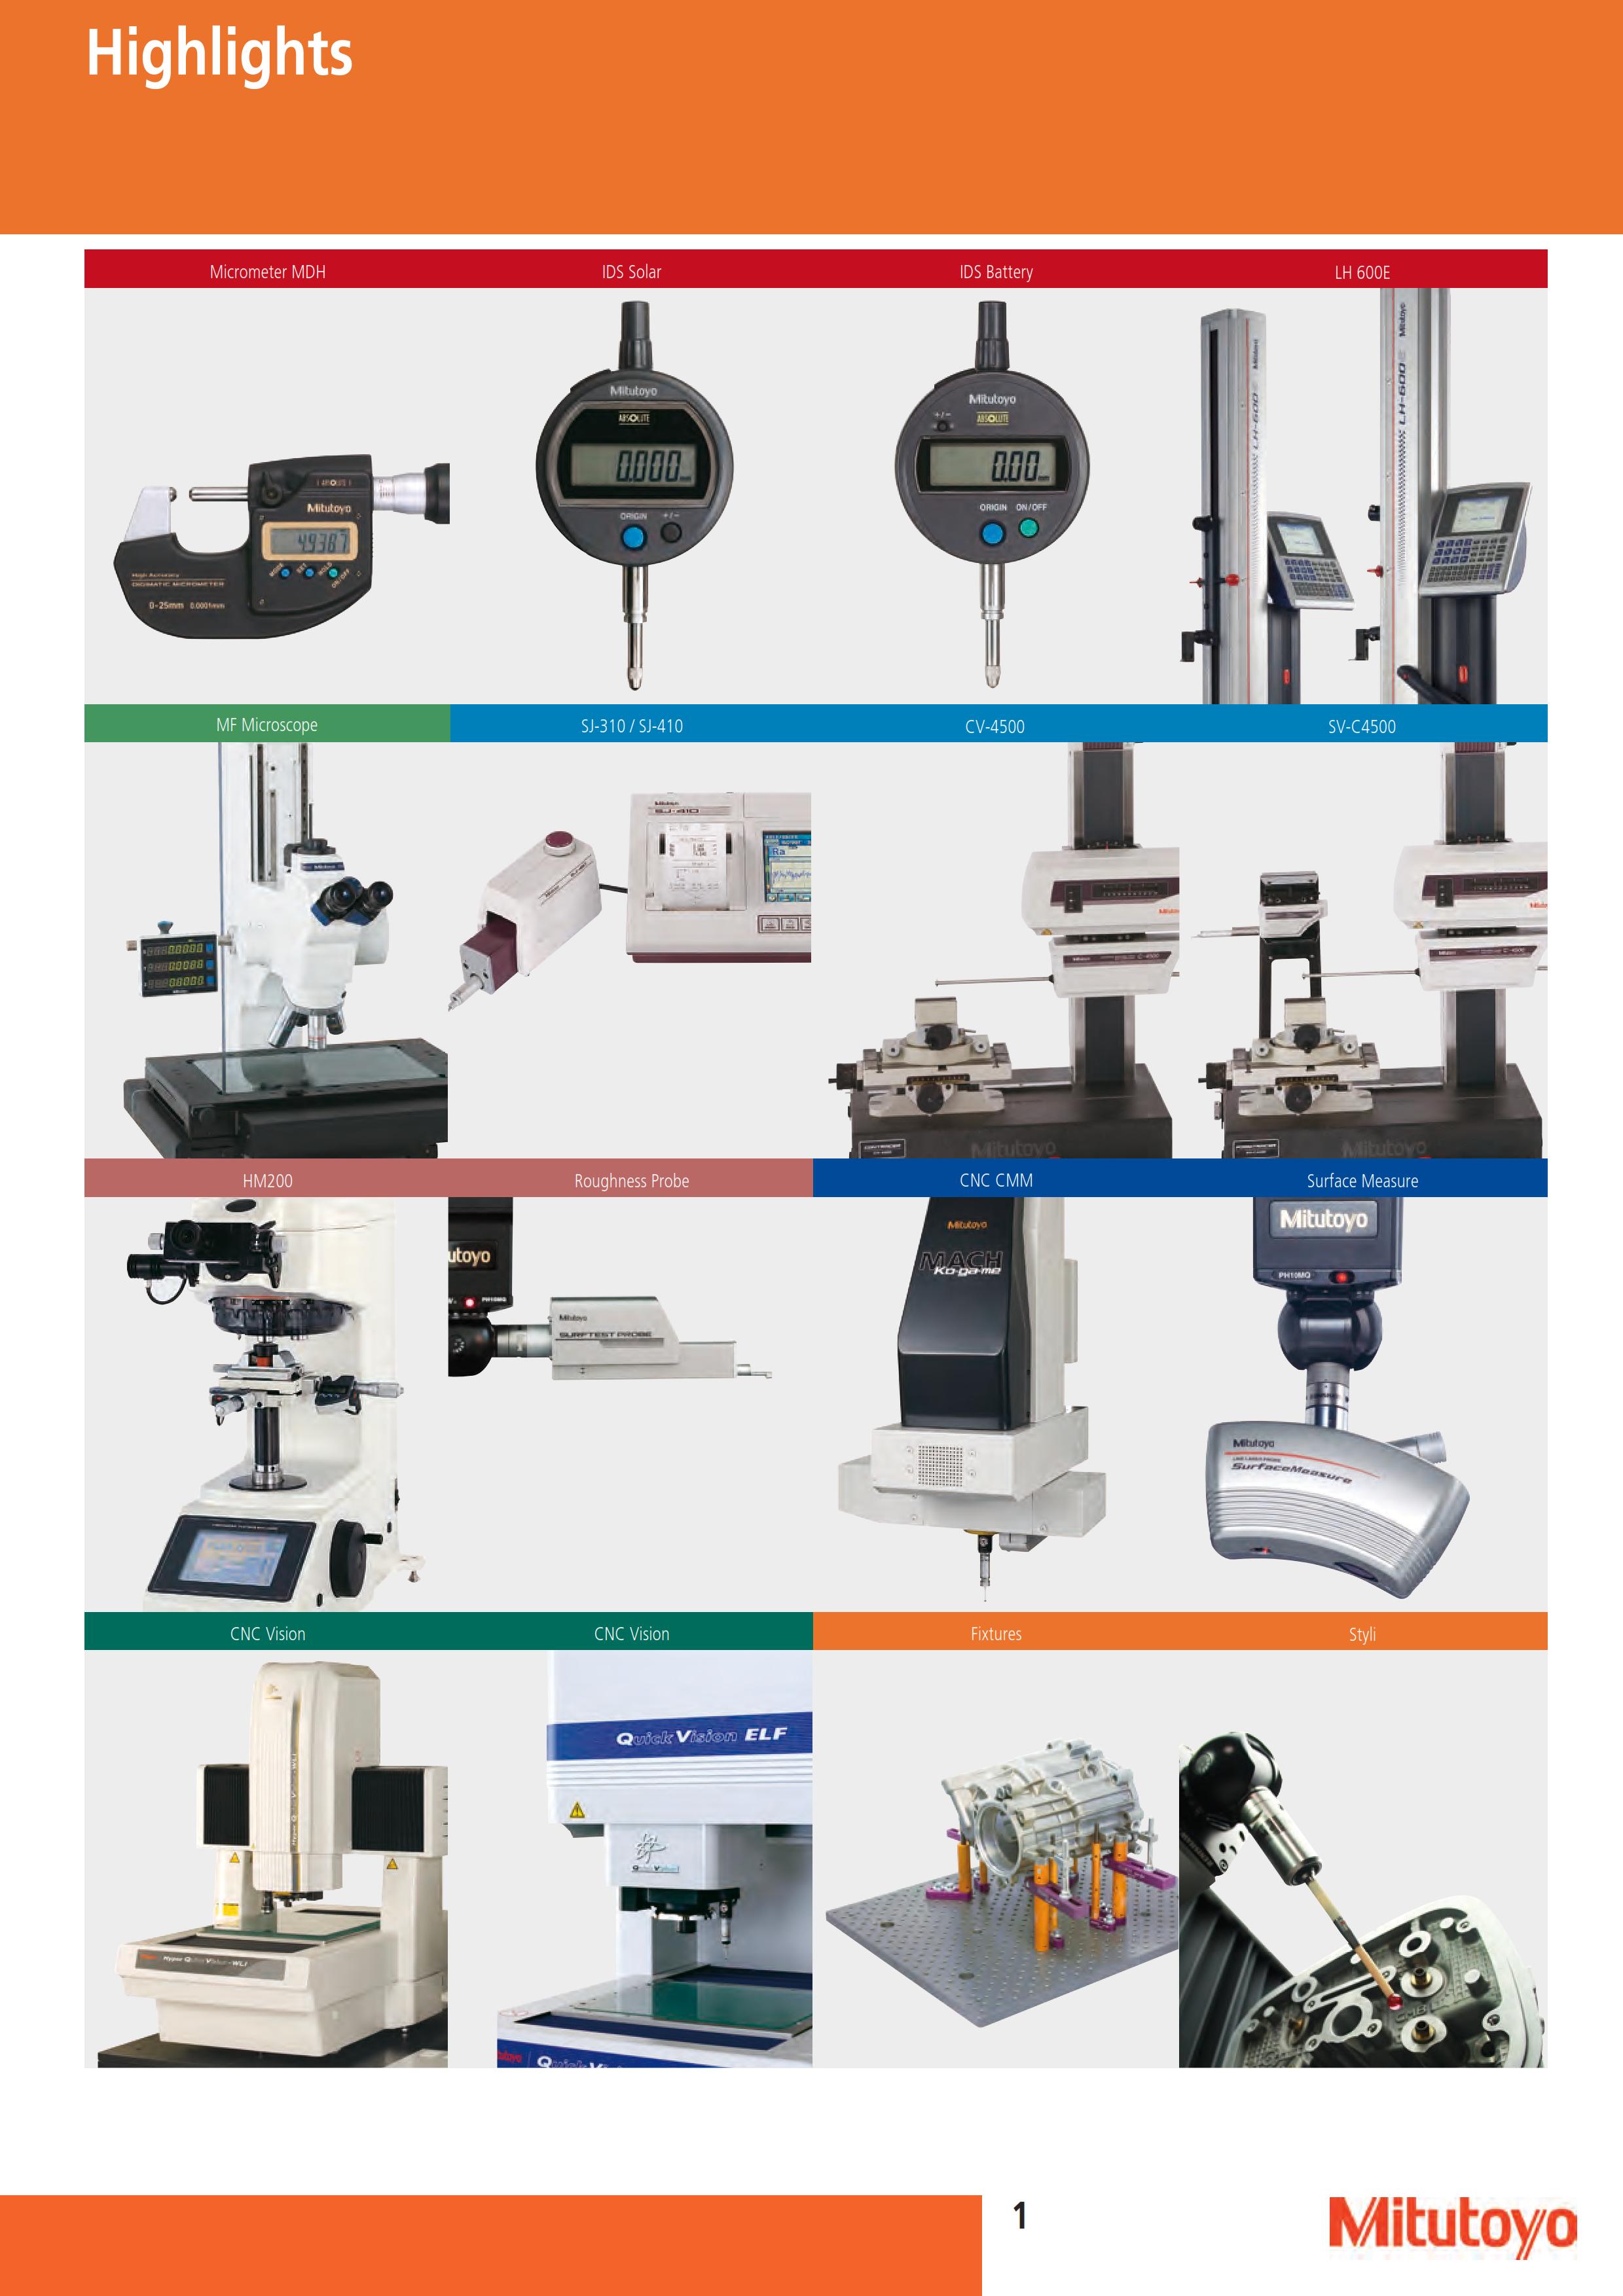 Mitutoyo Measuring Equipment : Mitutoyo micrometer vernier caliper dial gauge height